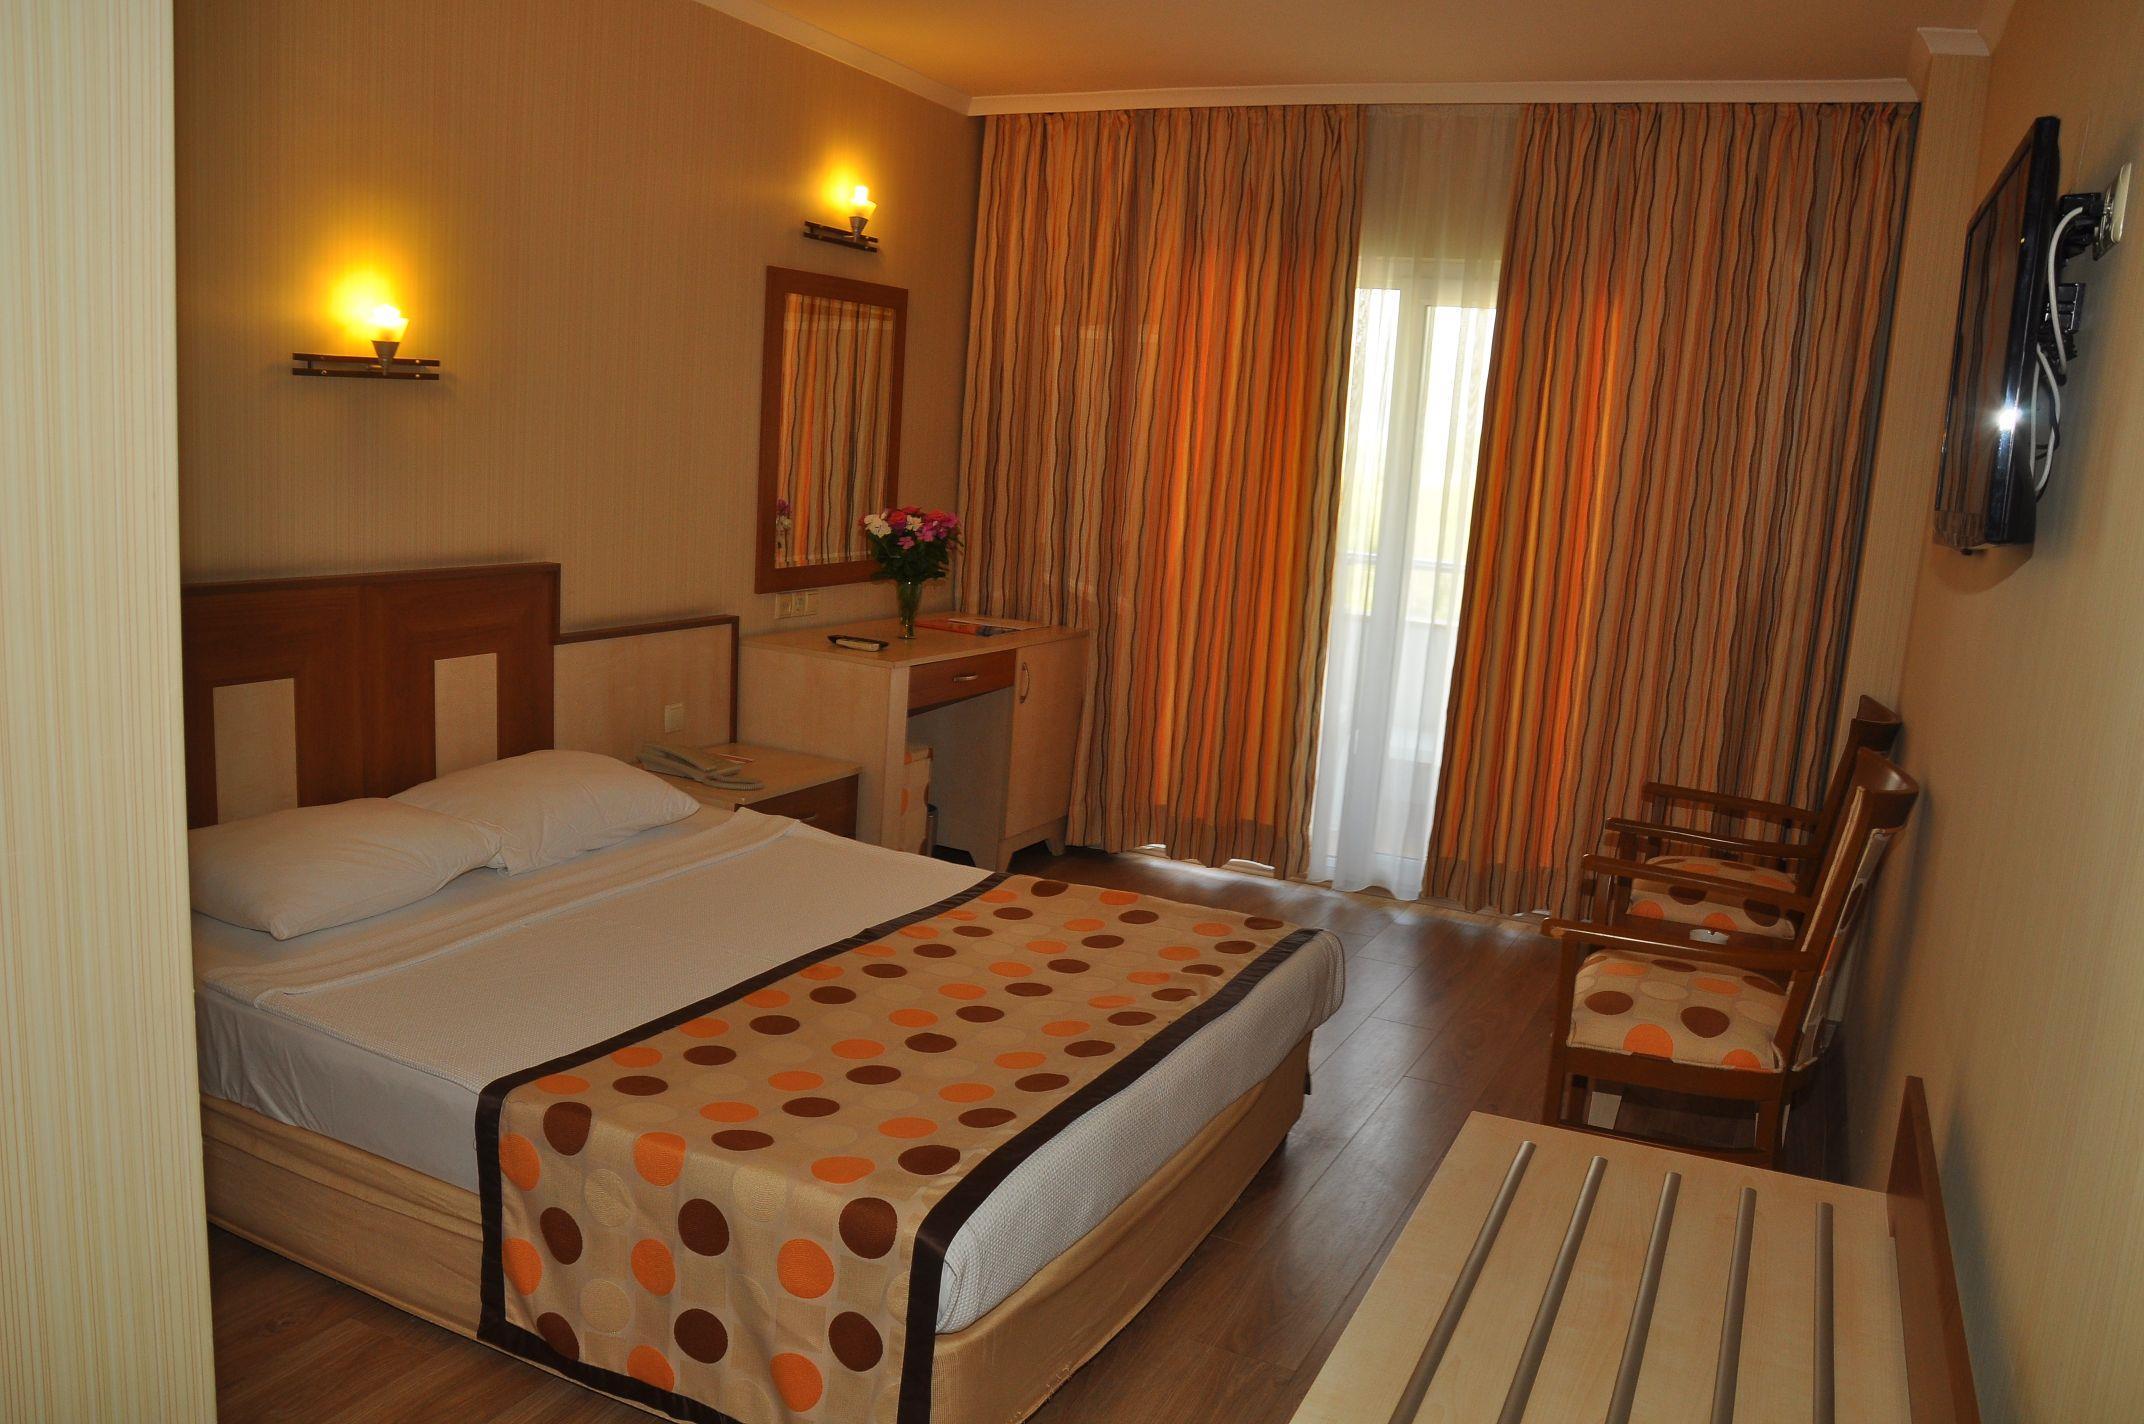 http://www.orextravel.sk/OREX/hotelphotos/stella-beach-hotel-alanya-general-0031.jpg